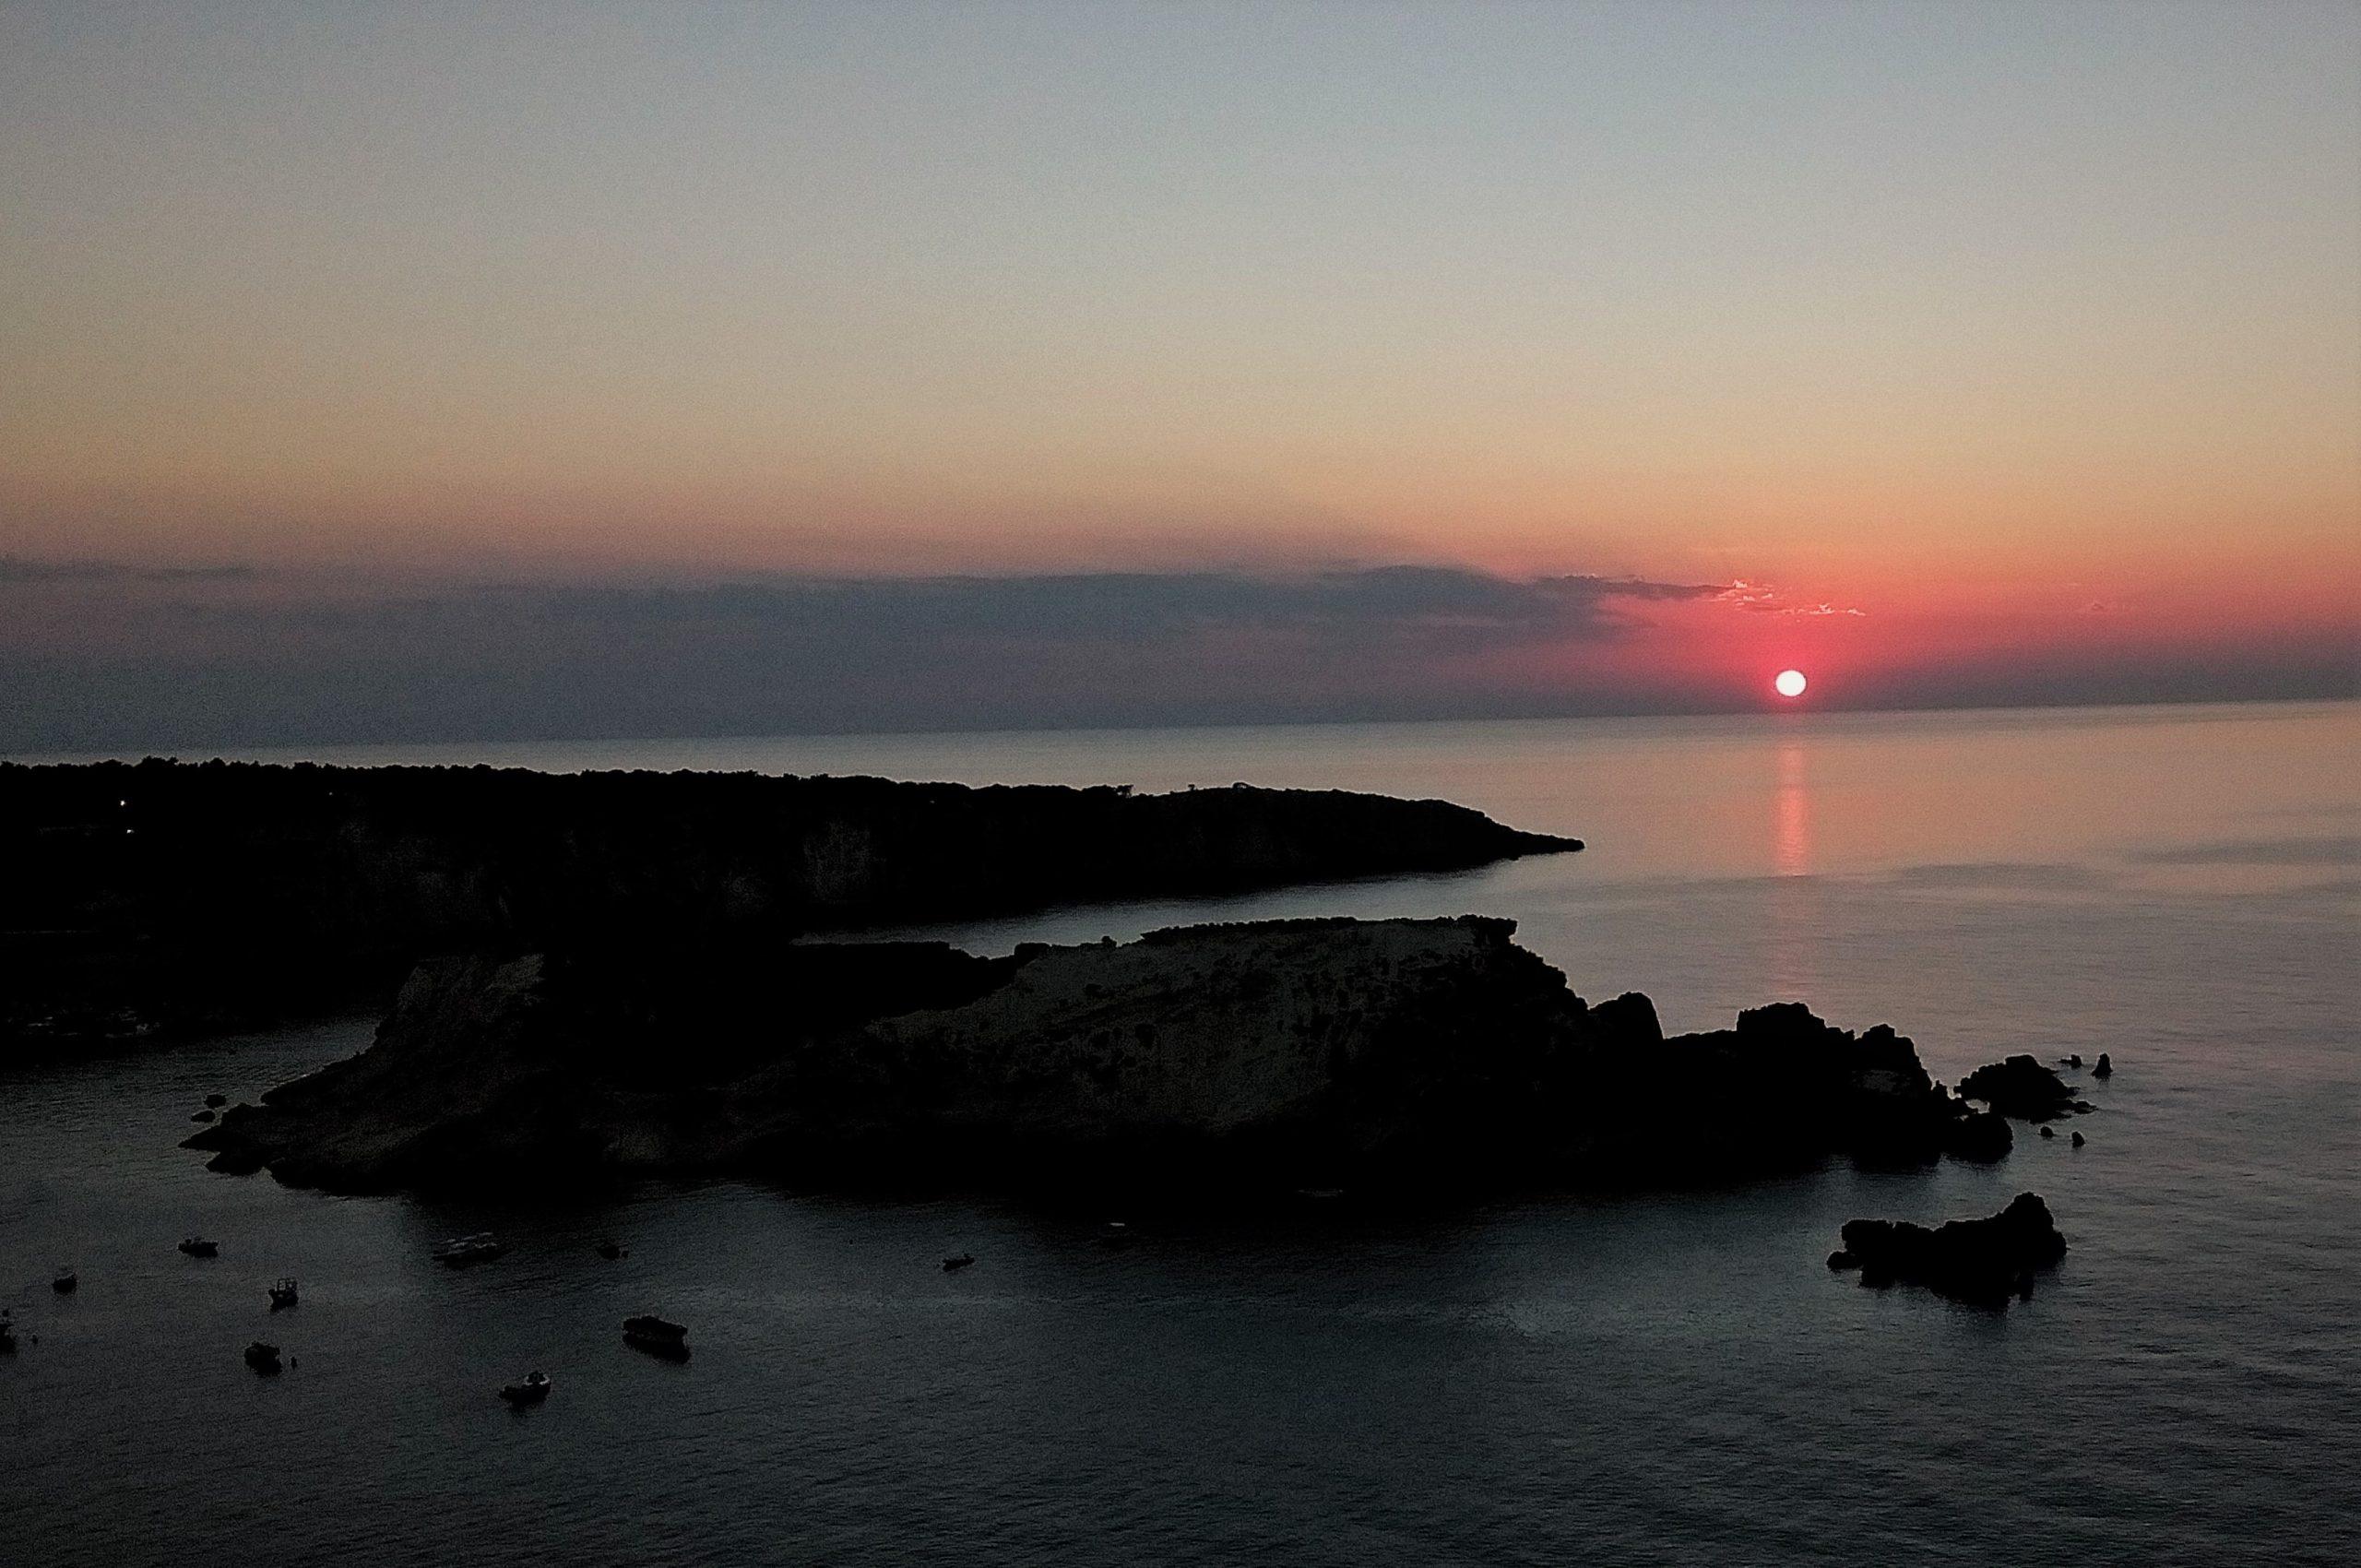 cretaccio la vecchia fantasmi isole tremiti tramonto